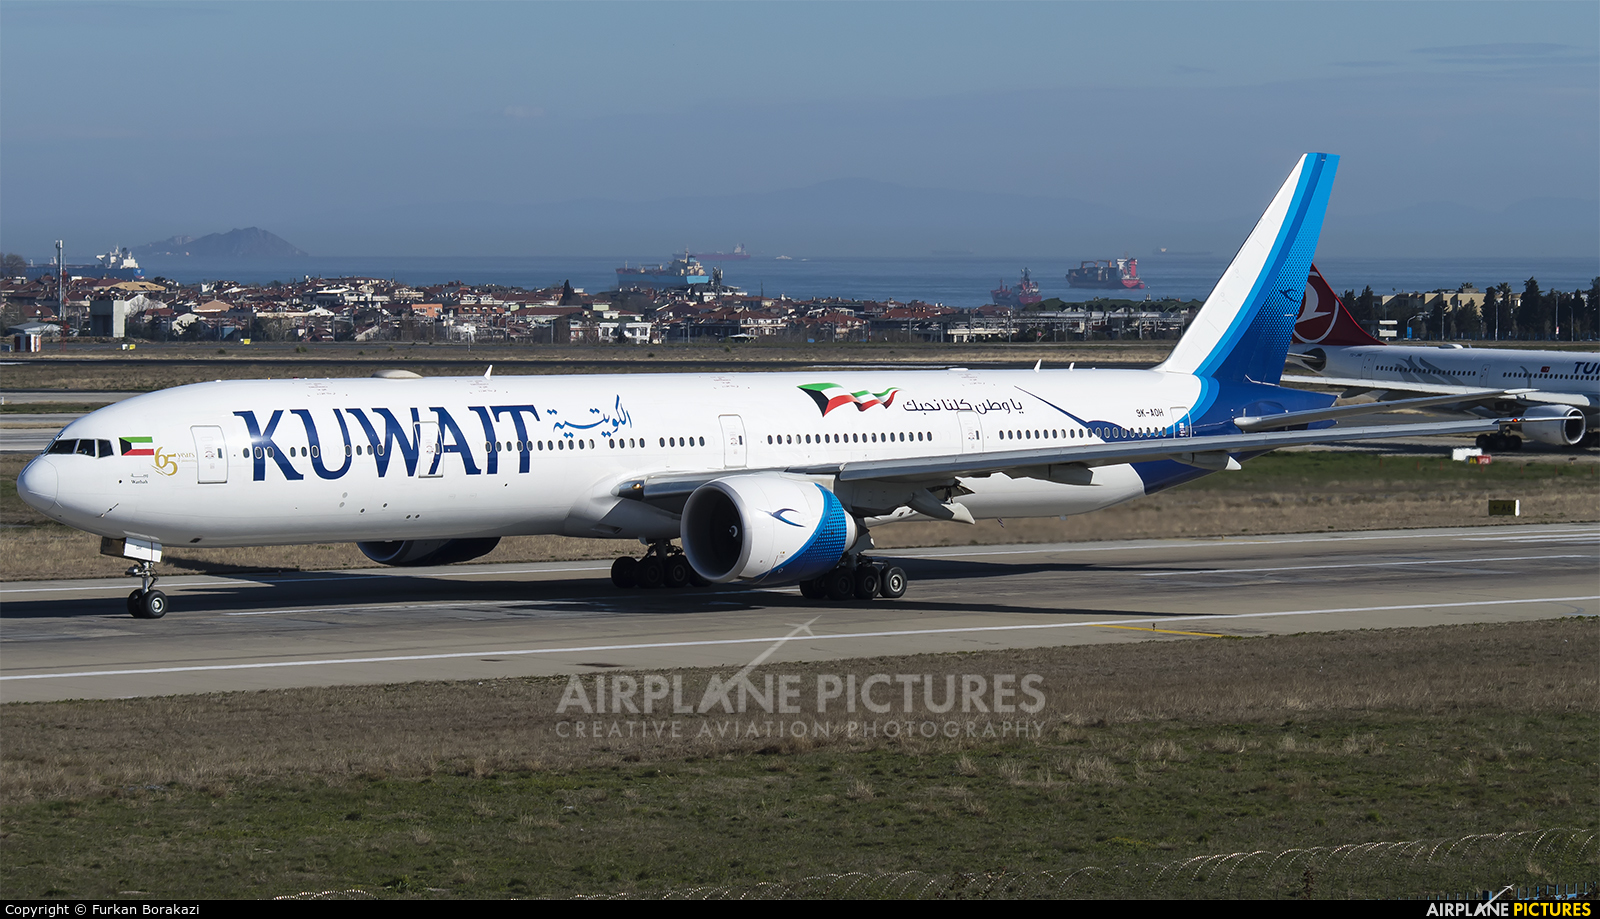 Kuwait Airways 9K-AOH aircraft at Istanbul - Ataturk